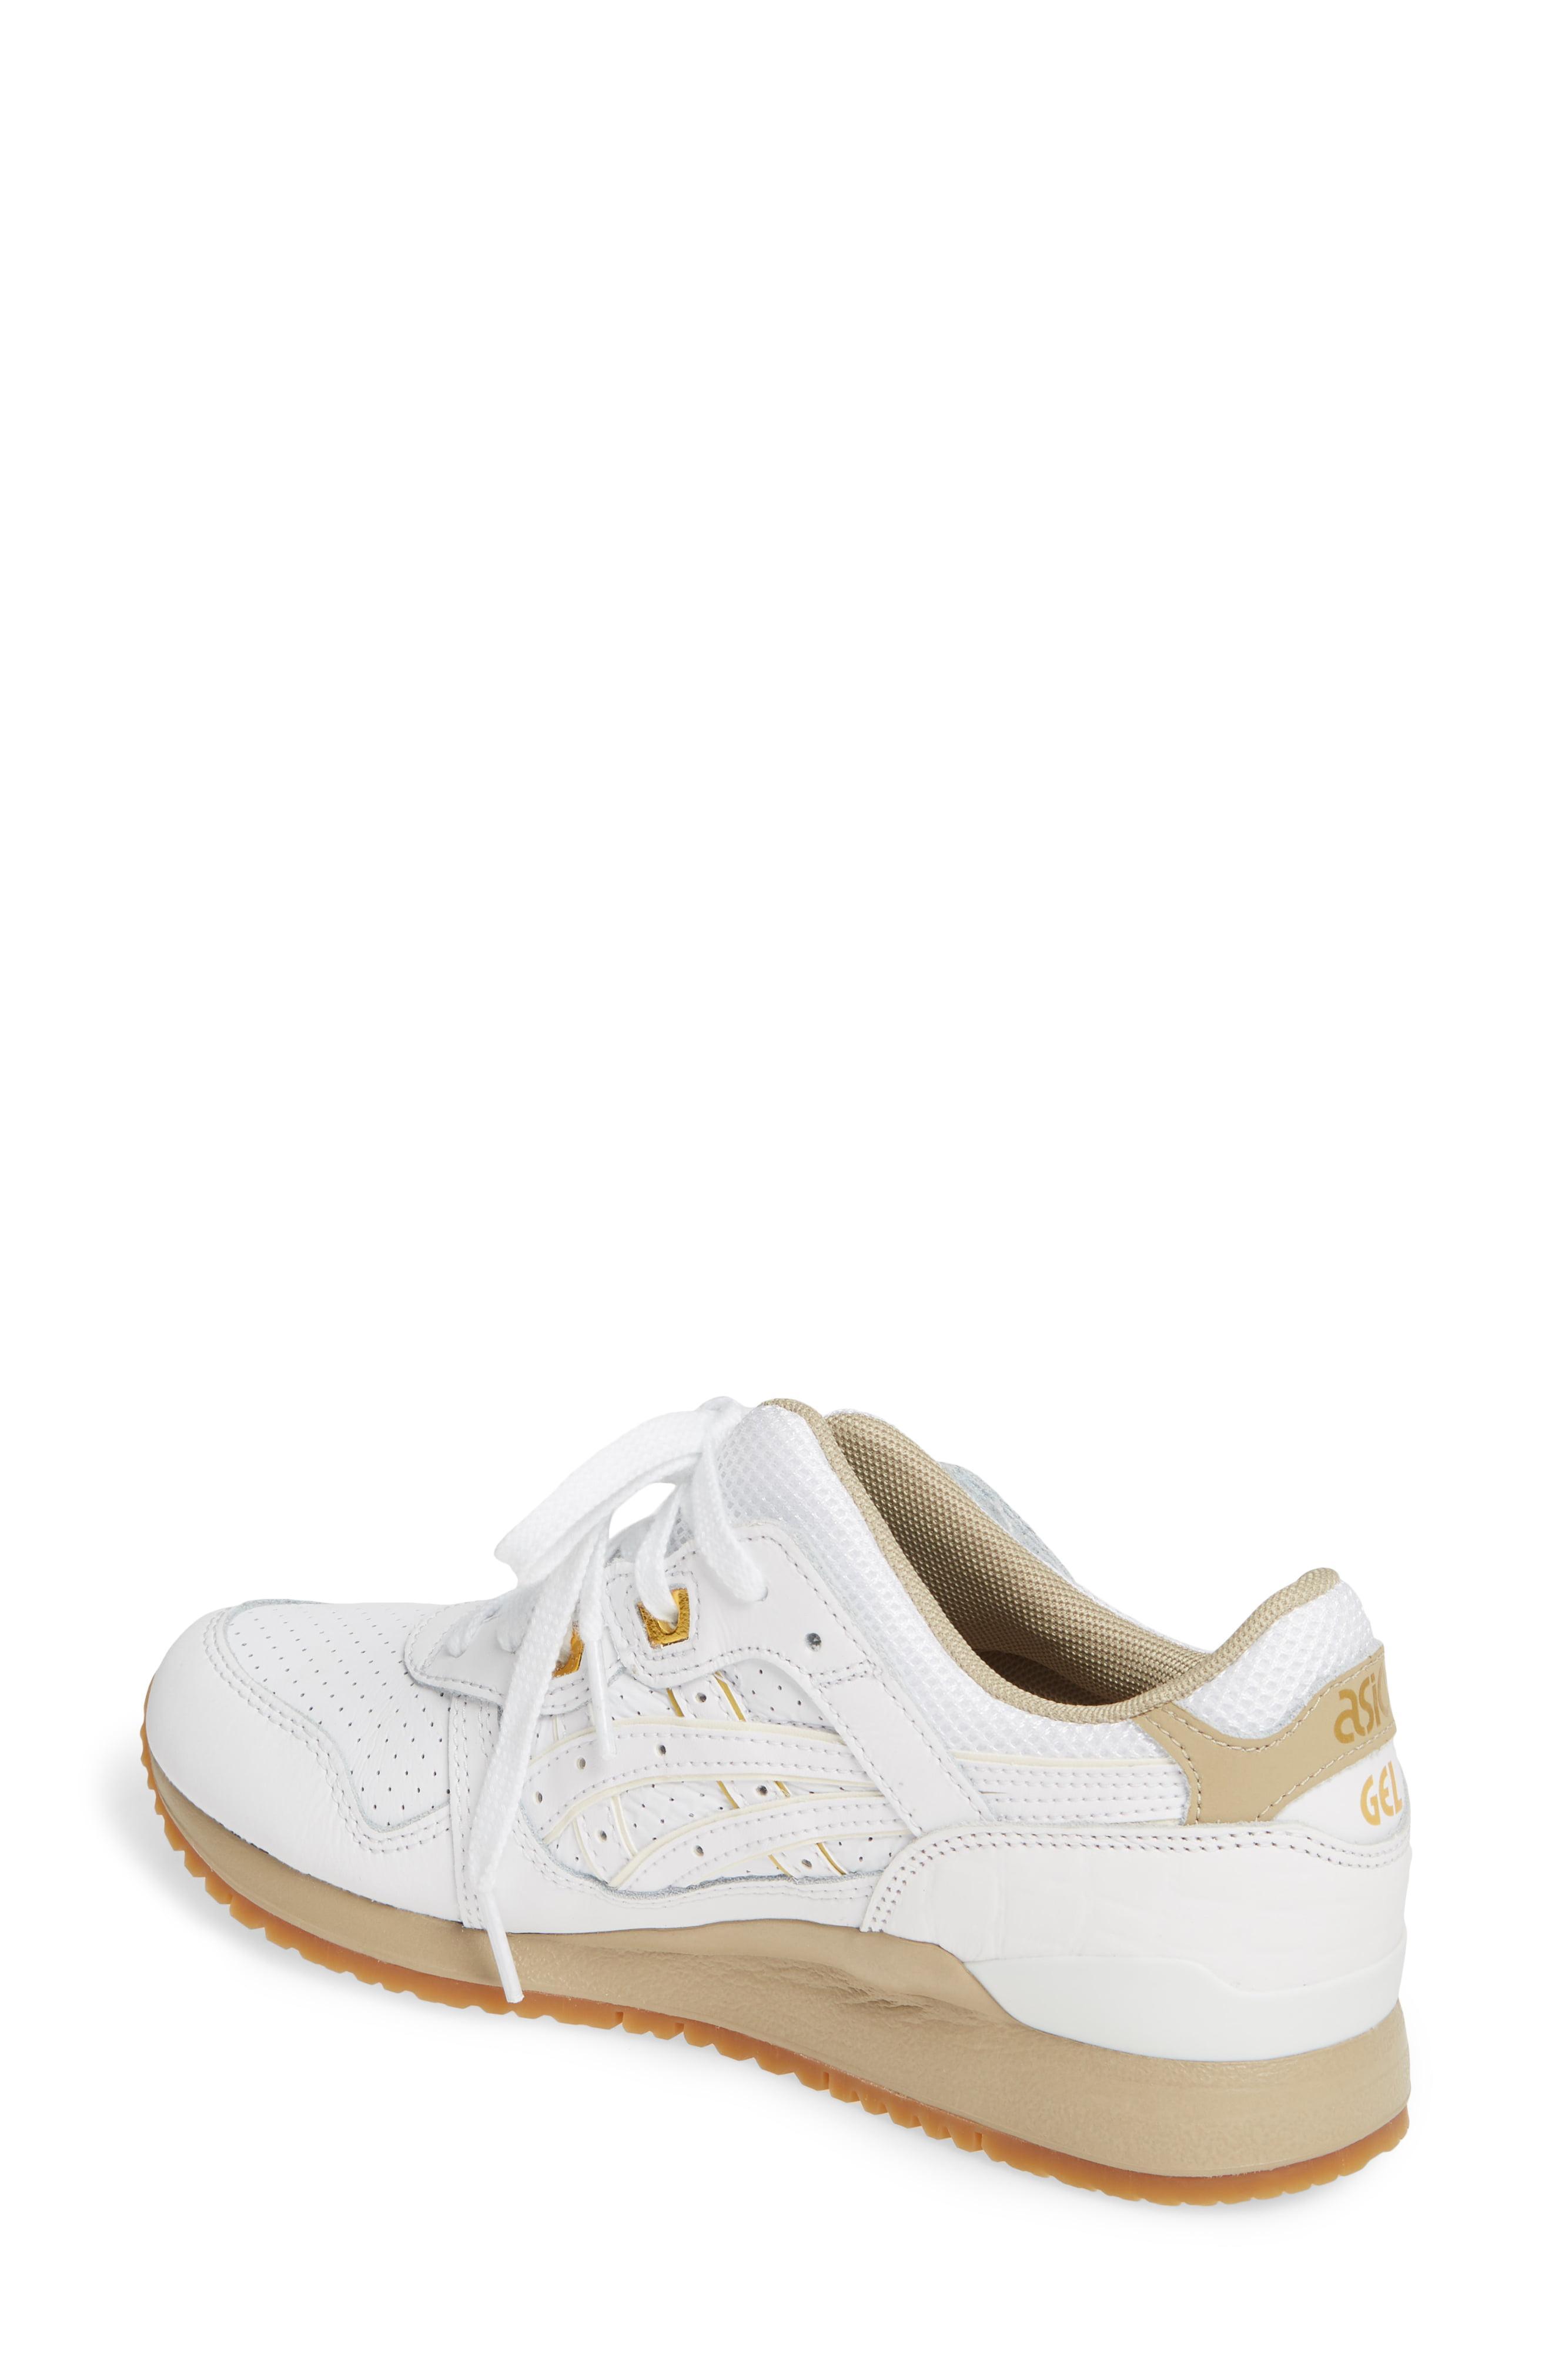 sports shoes b82d0 6e8c6 Lyst - Asics Asics 'gel-lyte Iii' Sneaker in White